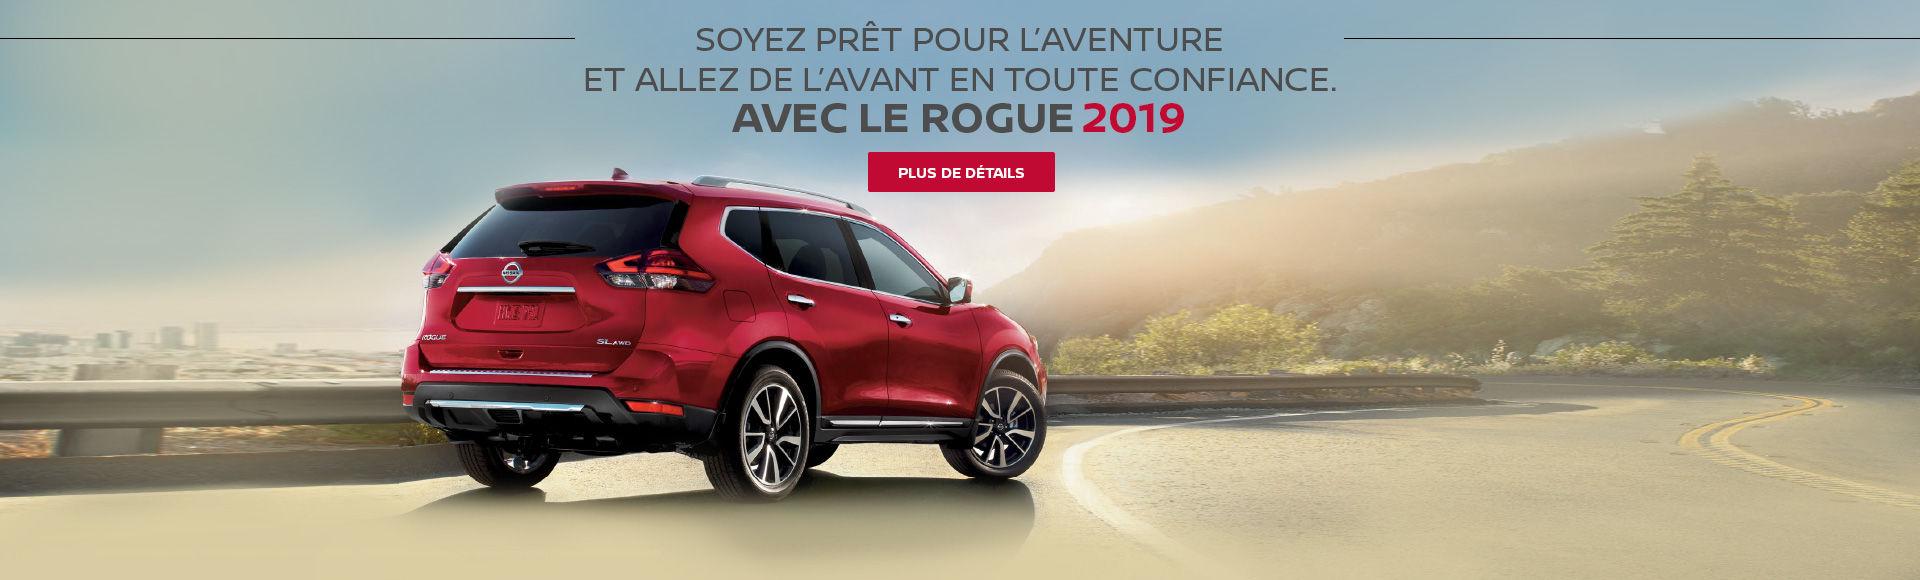 Rogue 2019 Alma Nissan